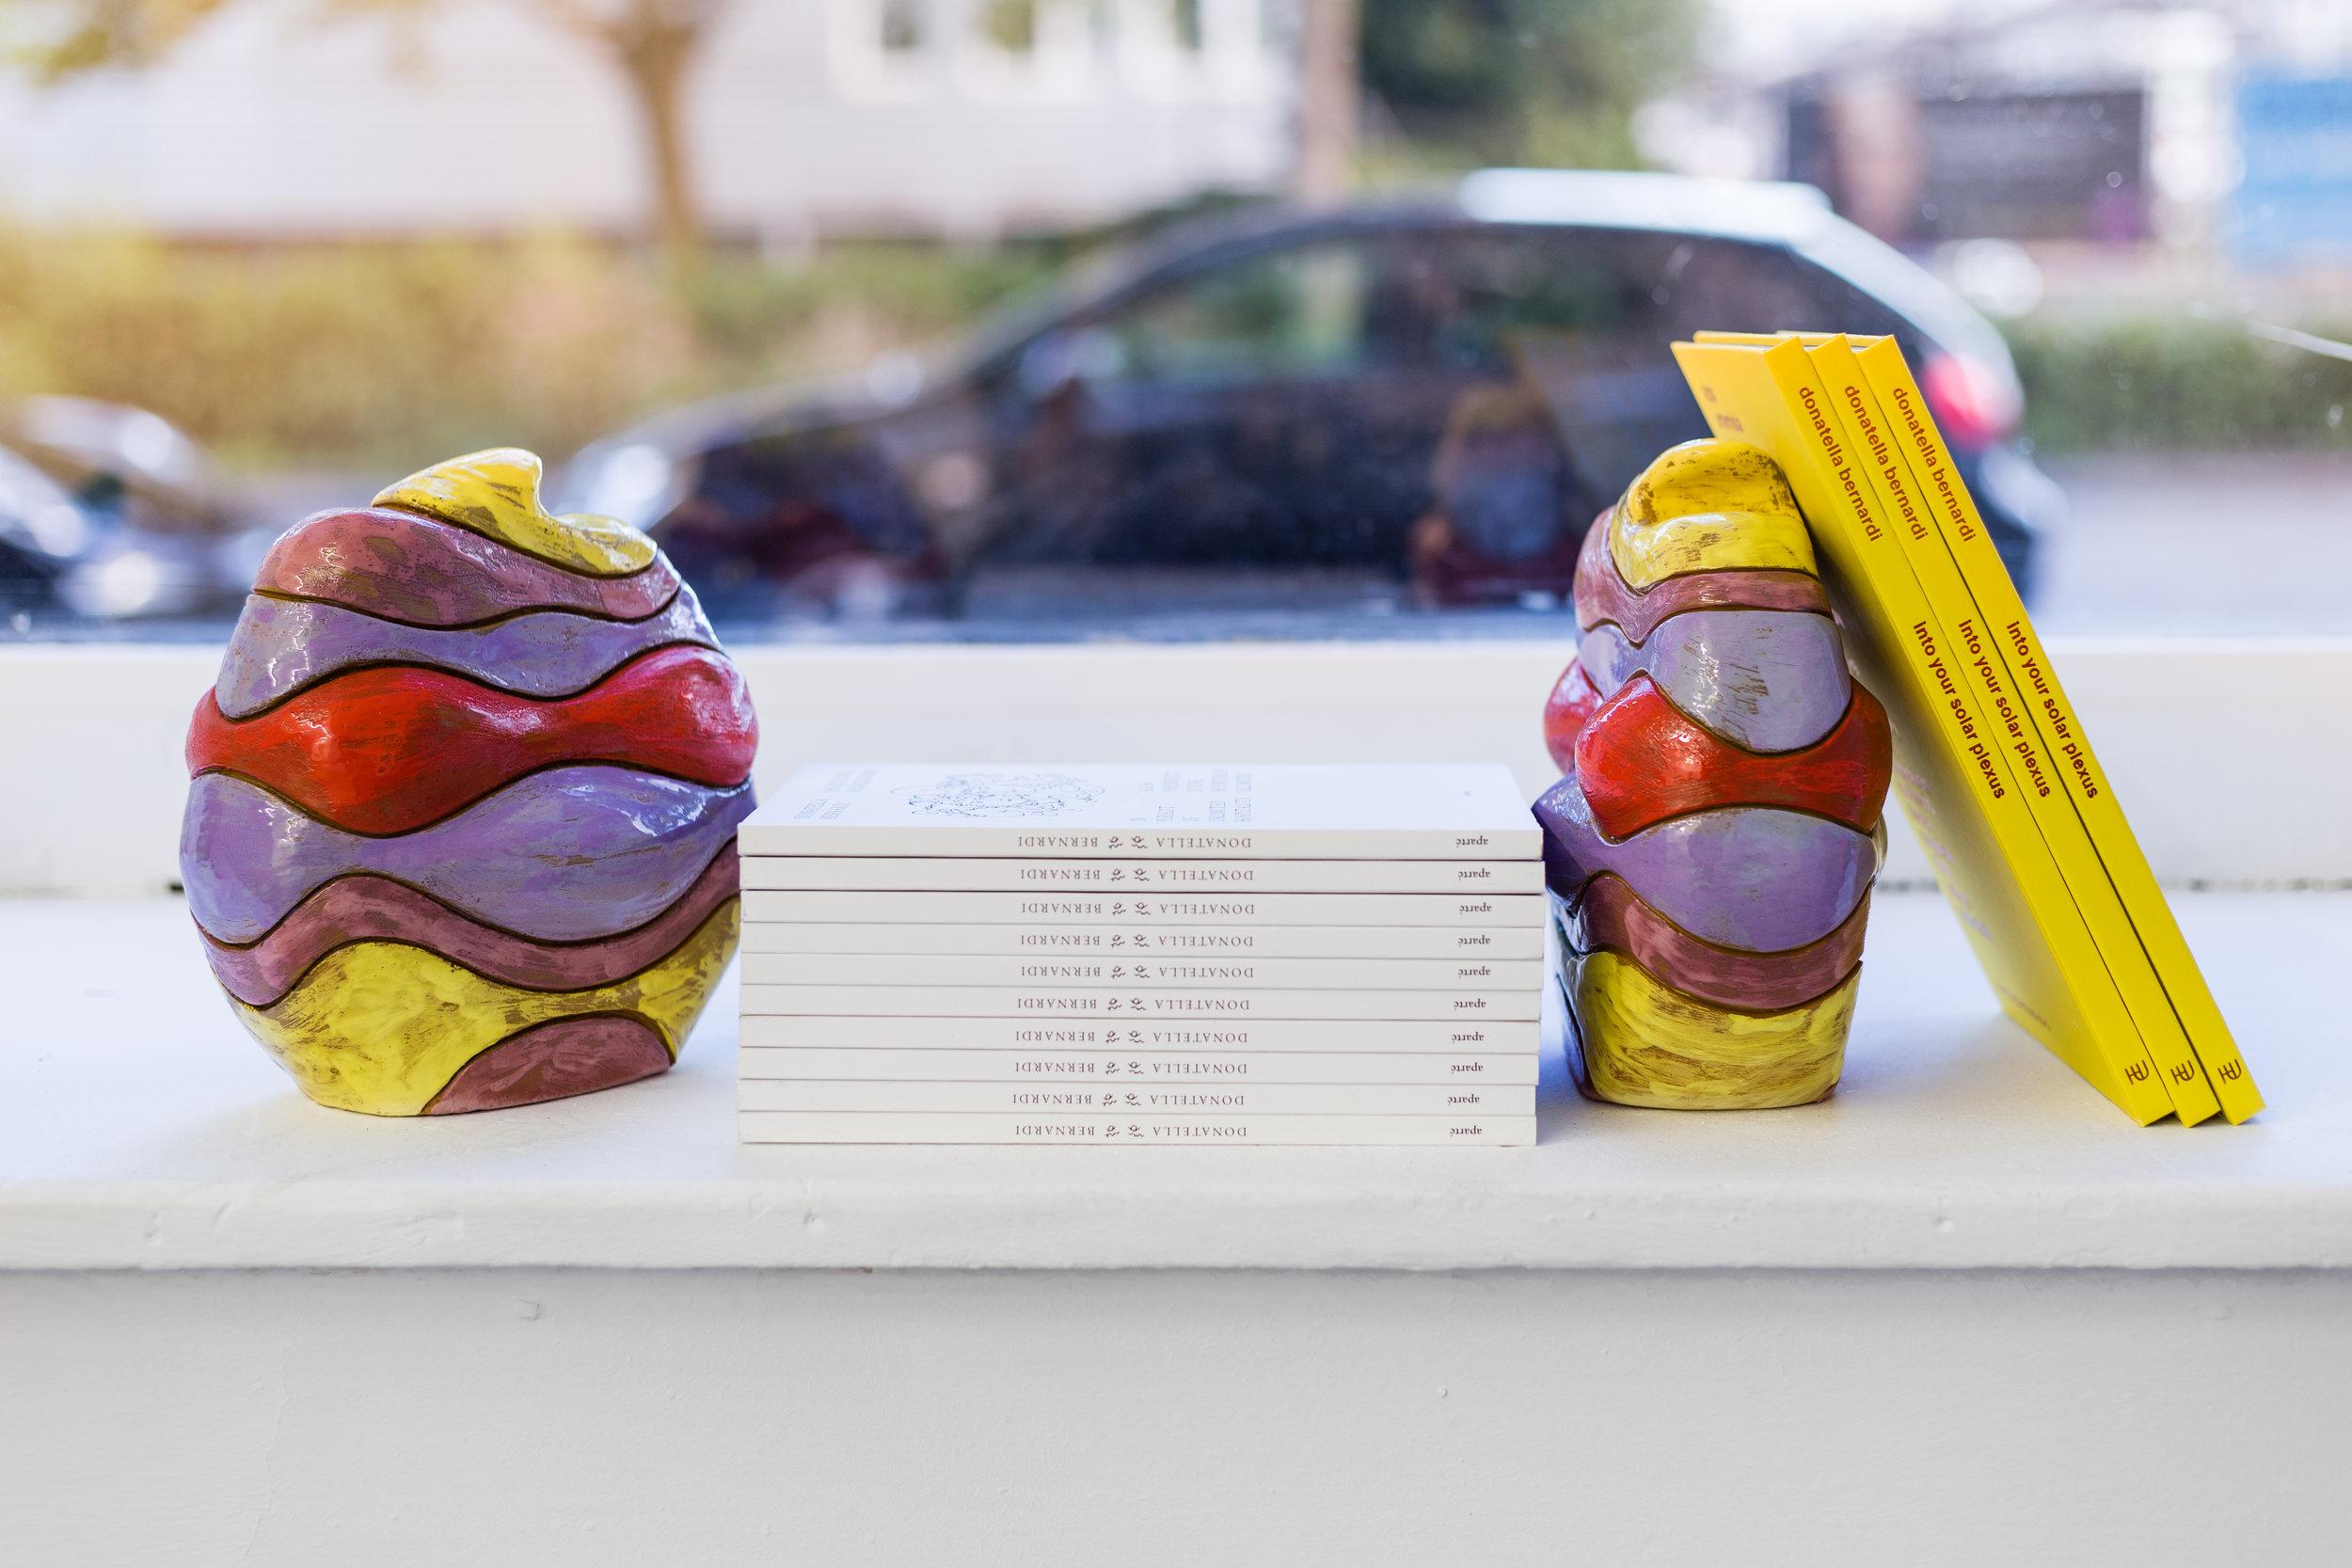 Donatella Bernardi,  Almost Ninja Turtles I-IV,  2017, artist books, clay with engobe and transparent glaze, 20 x 18 x 14 cm (each) Photo: Kilian Bannwart